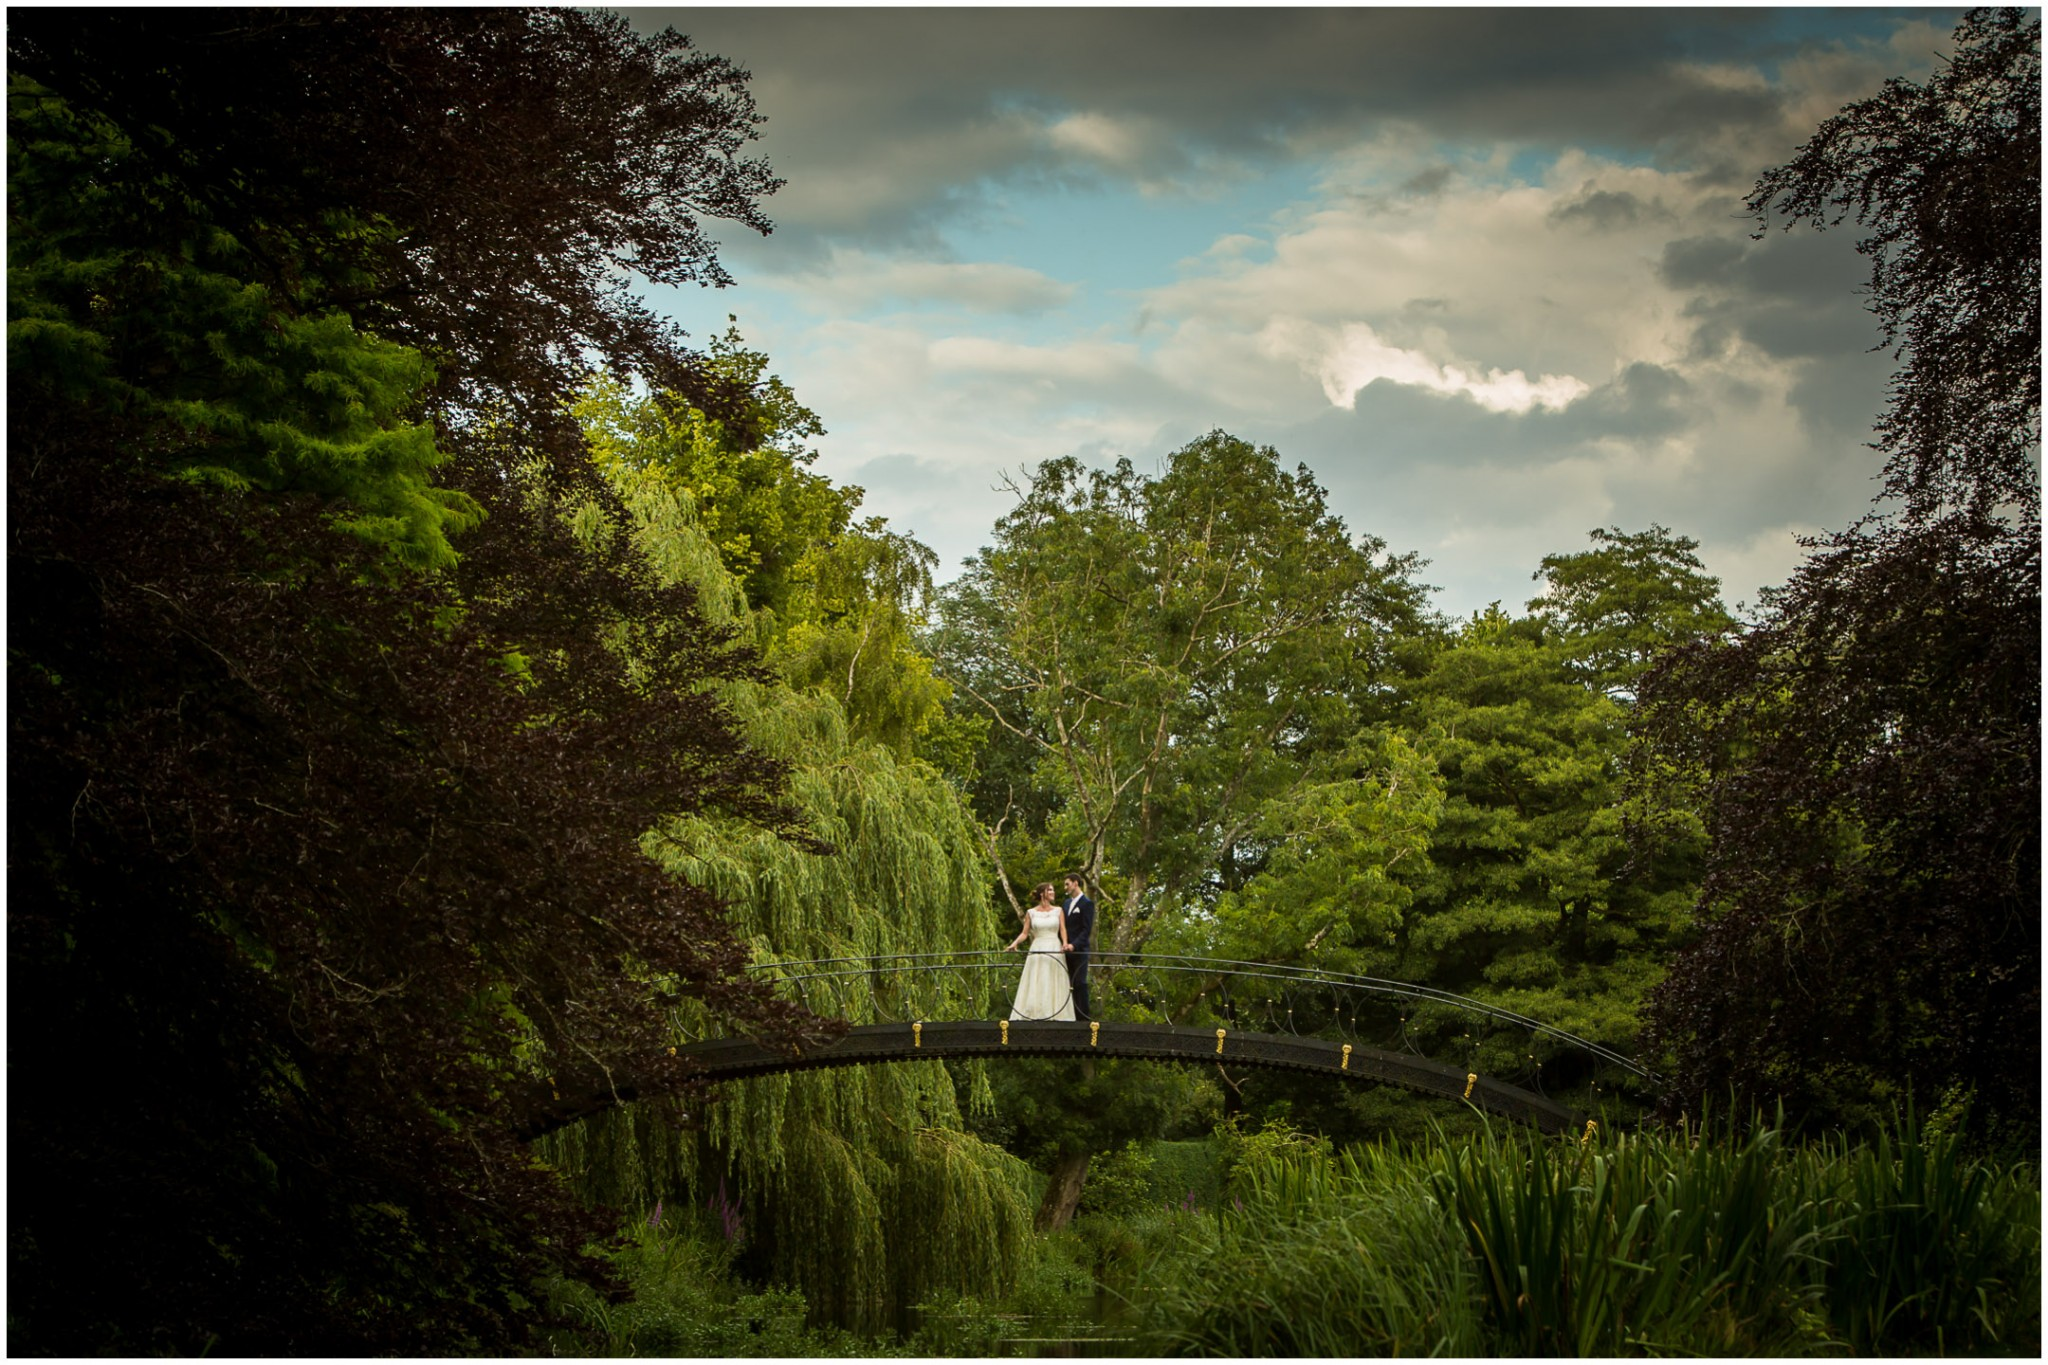 Avington Park Wedding Bride & Groom on Bridge 002